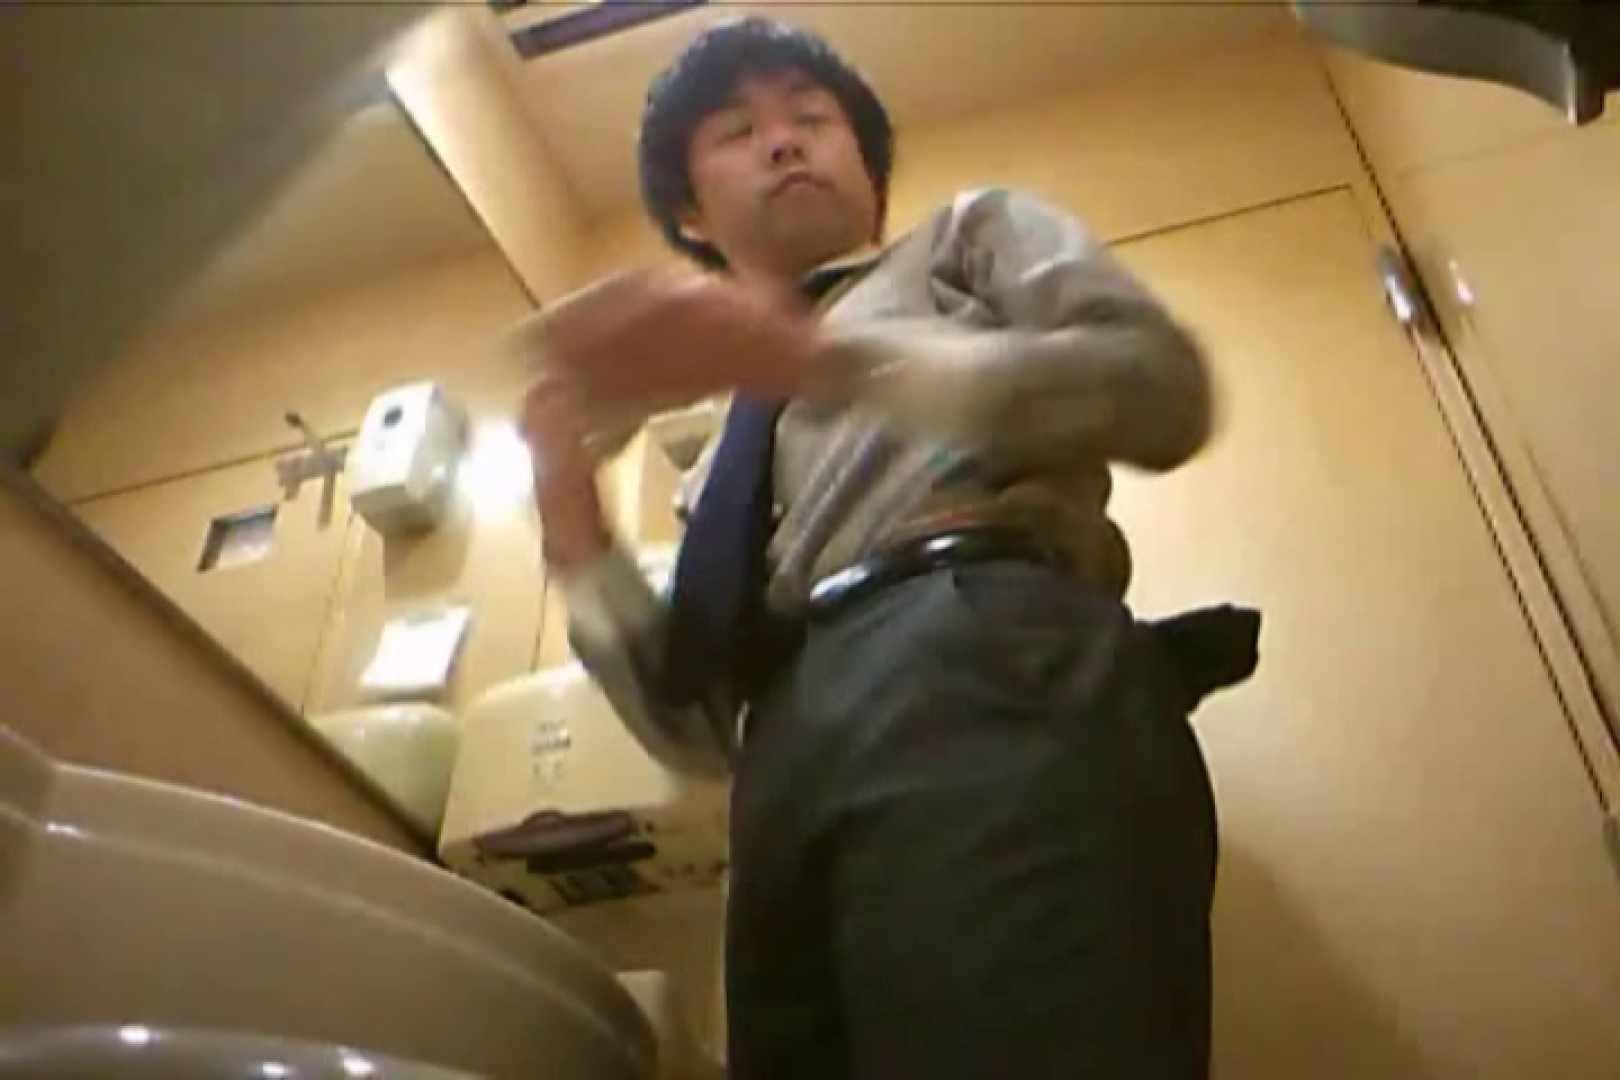 SEASON 2ND!掴み取りさんの洗面所覗き!in新幹線!VOL.09 覗き特集 ゲイAV画像 9画像 7